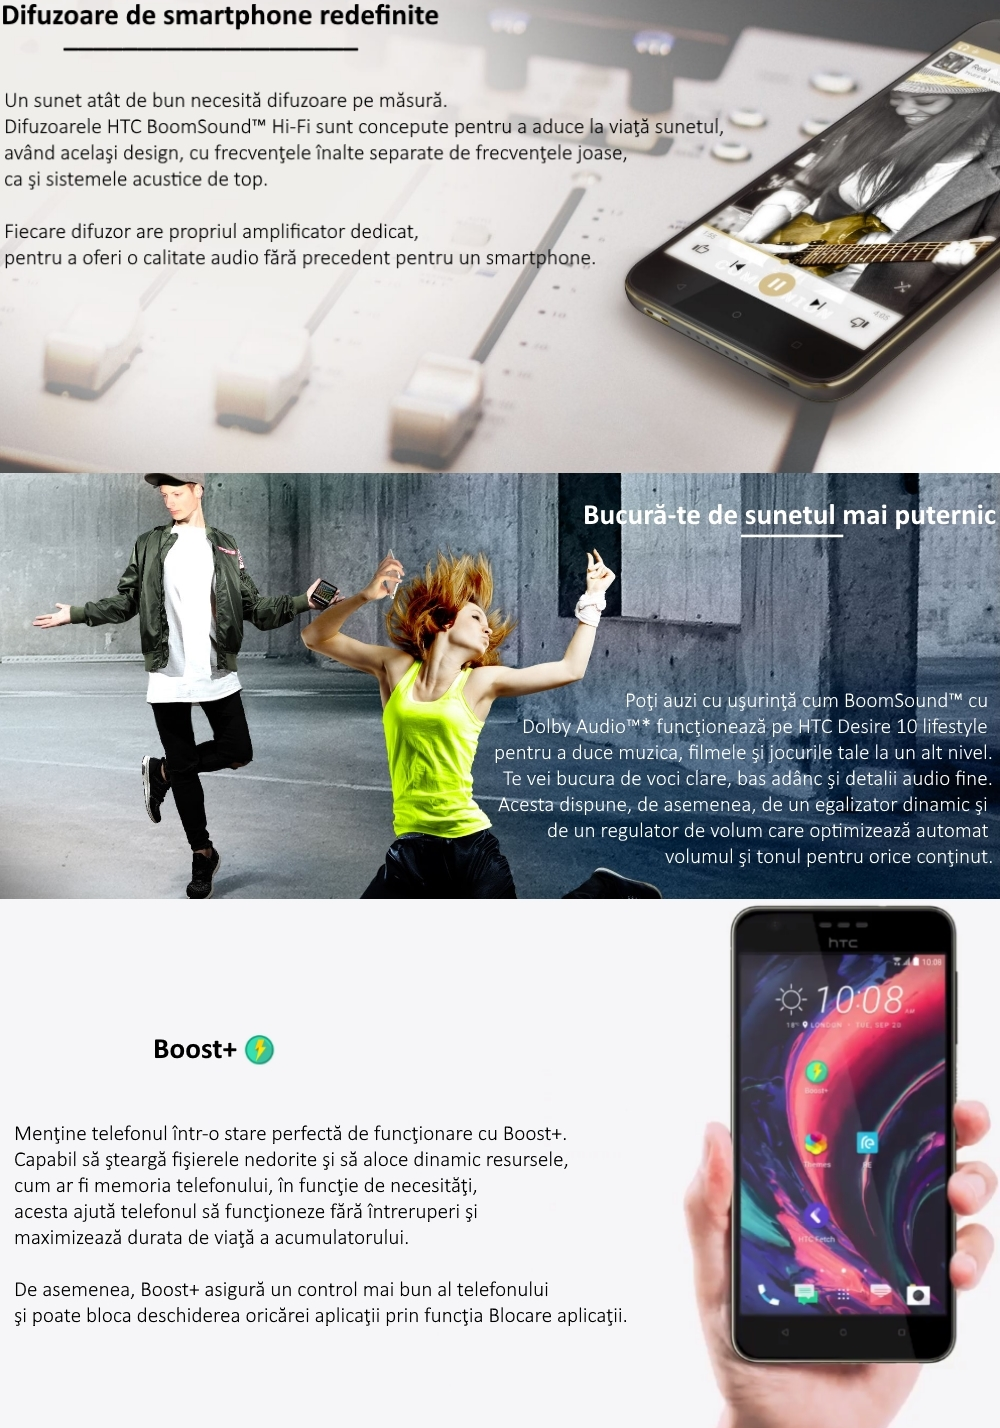 telefon-mobil-single-sim-htc-desire-10-lifestyle-quad-core-1-4-ghz-16gb-2gb-ram-lte-stone-black-1